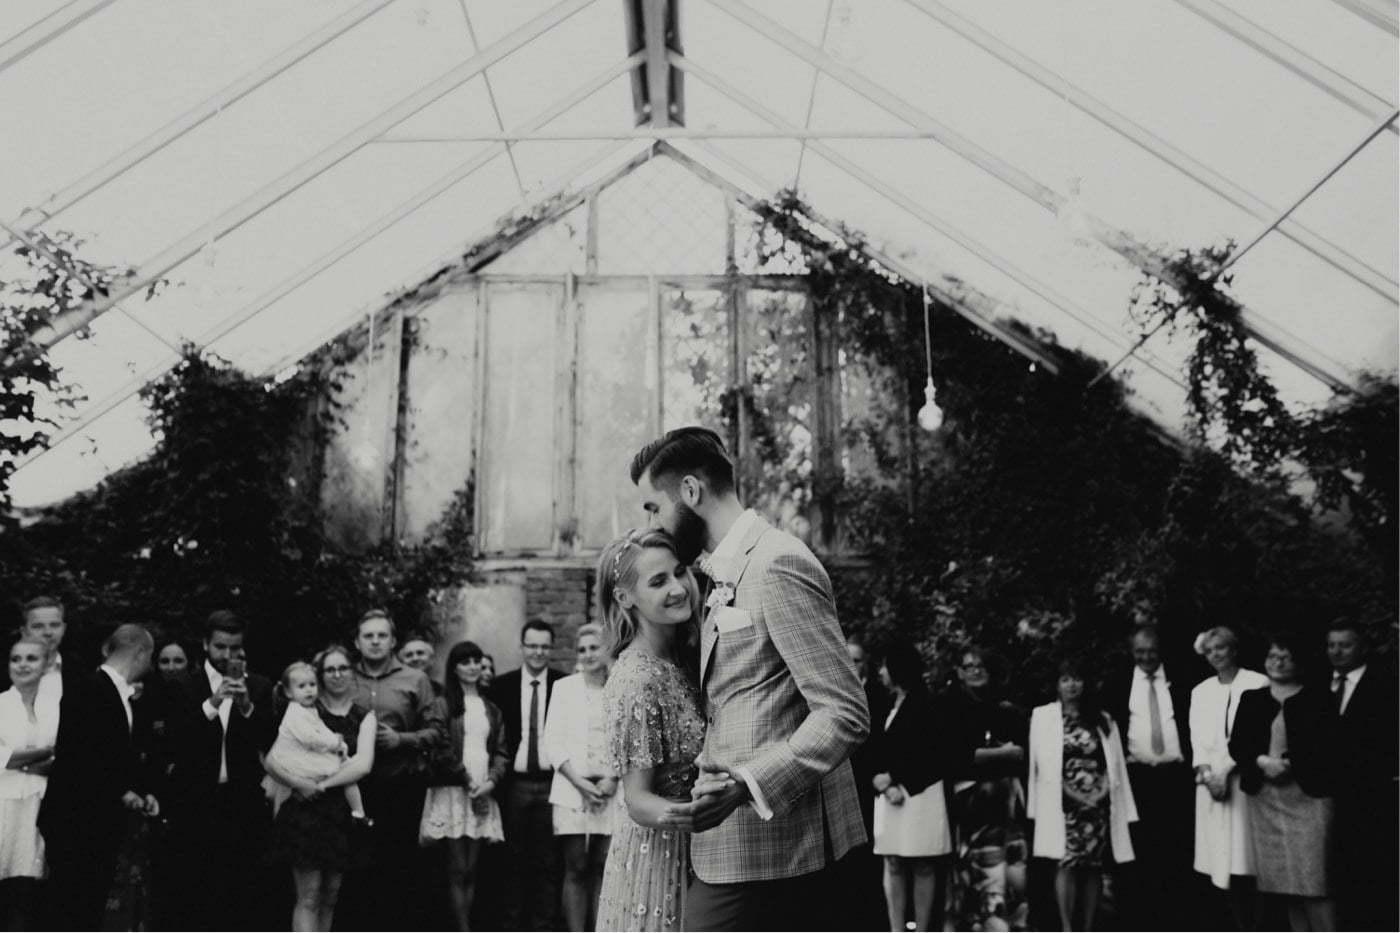 ewelina zieba rustykalne wesele stara oranzeria warszawa 070